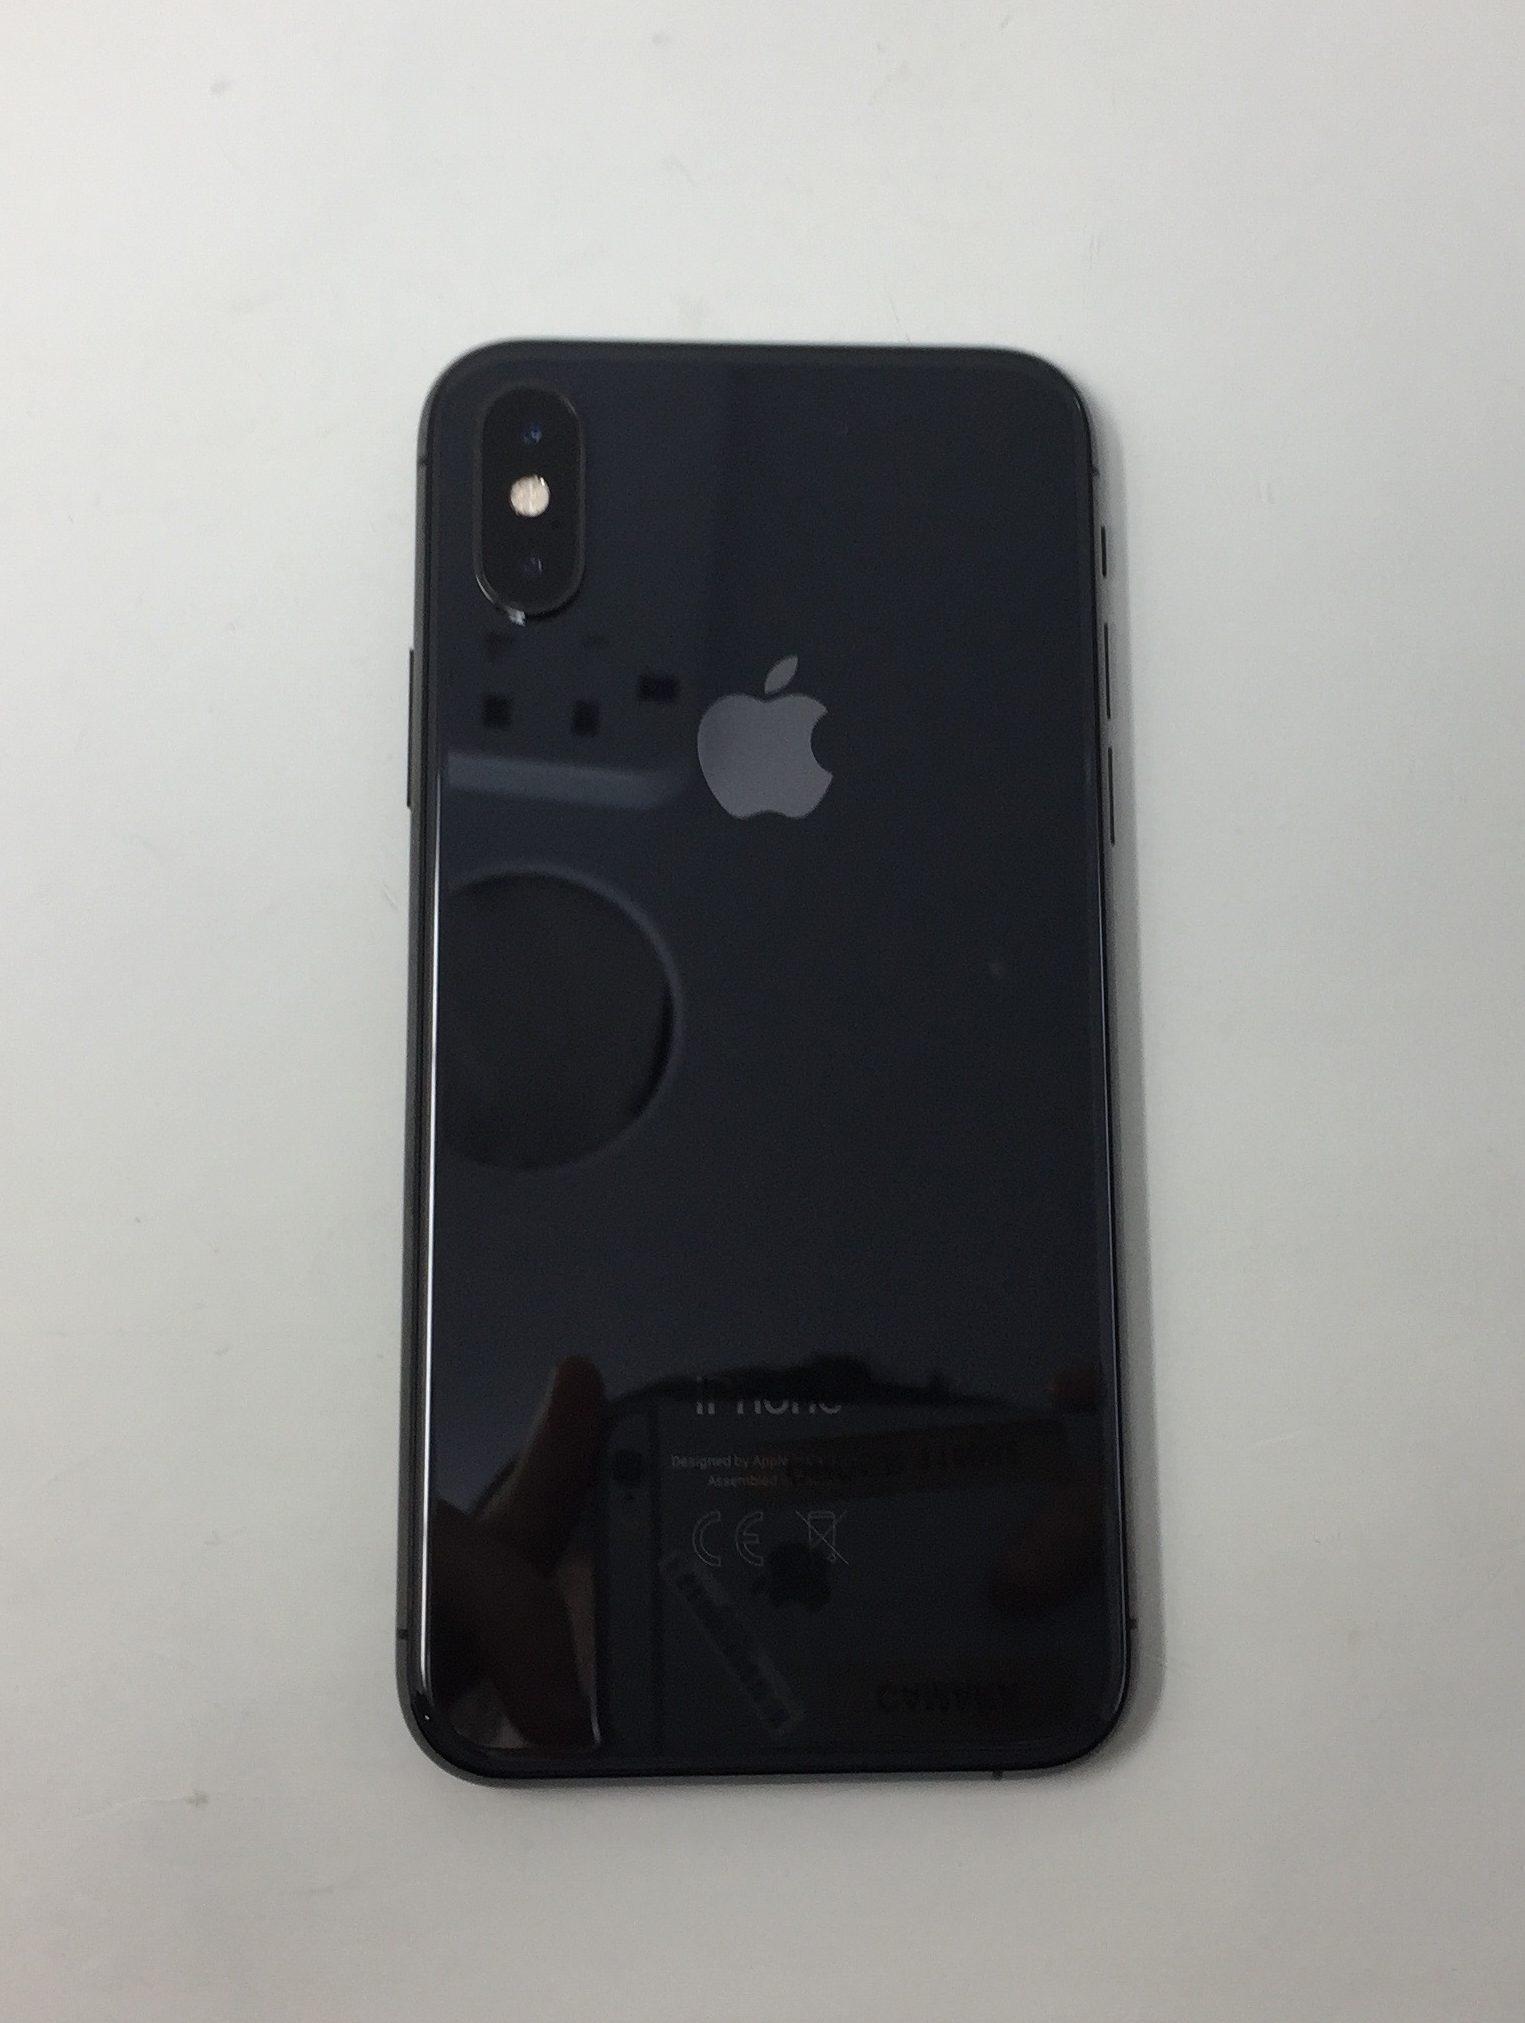 iPhone XS 256GB, 256 GB, SPACE GRAY, imagen 2